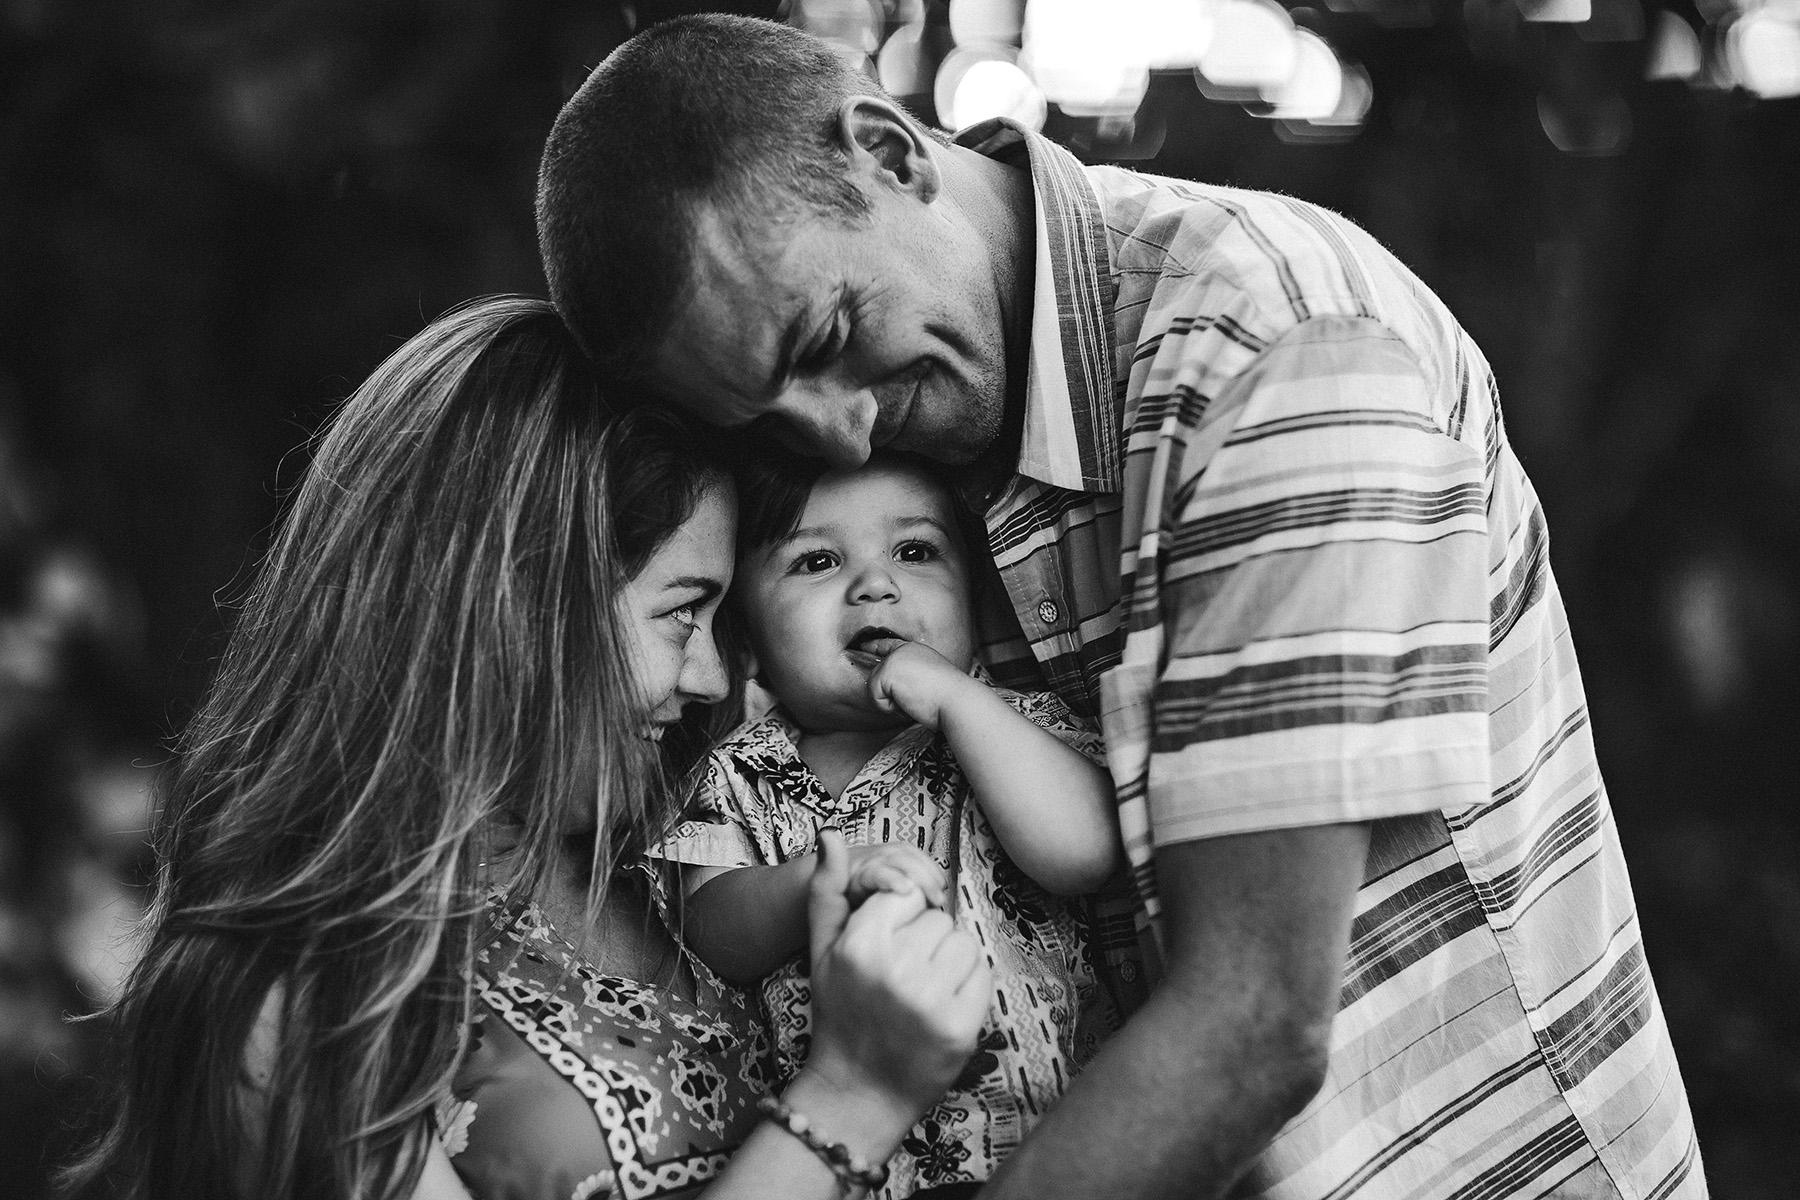 broward-family-photographer-emotion-unposed-beautiful-love.jpg